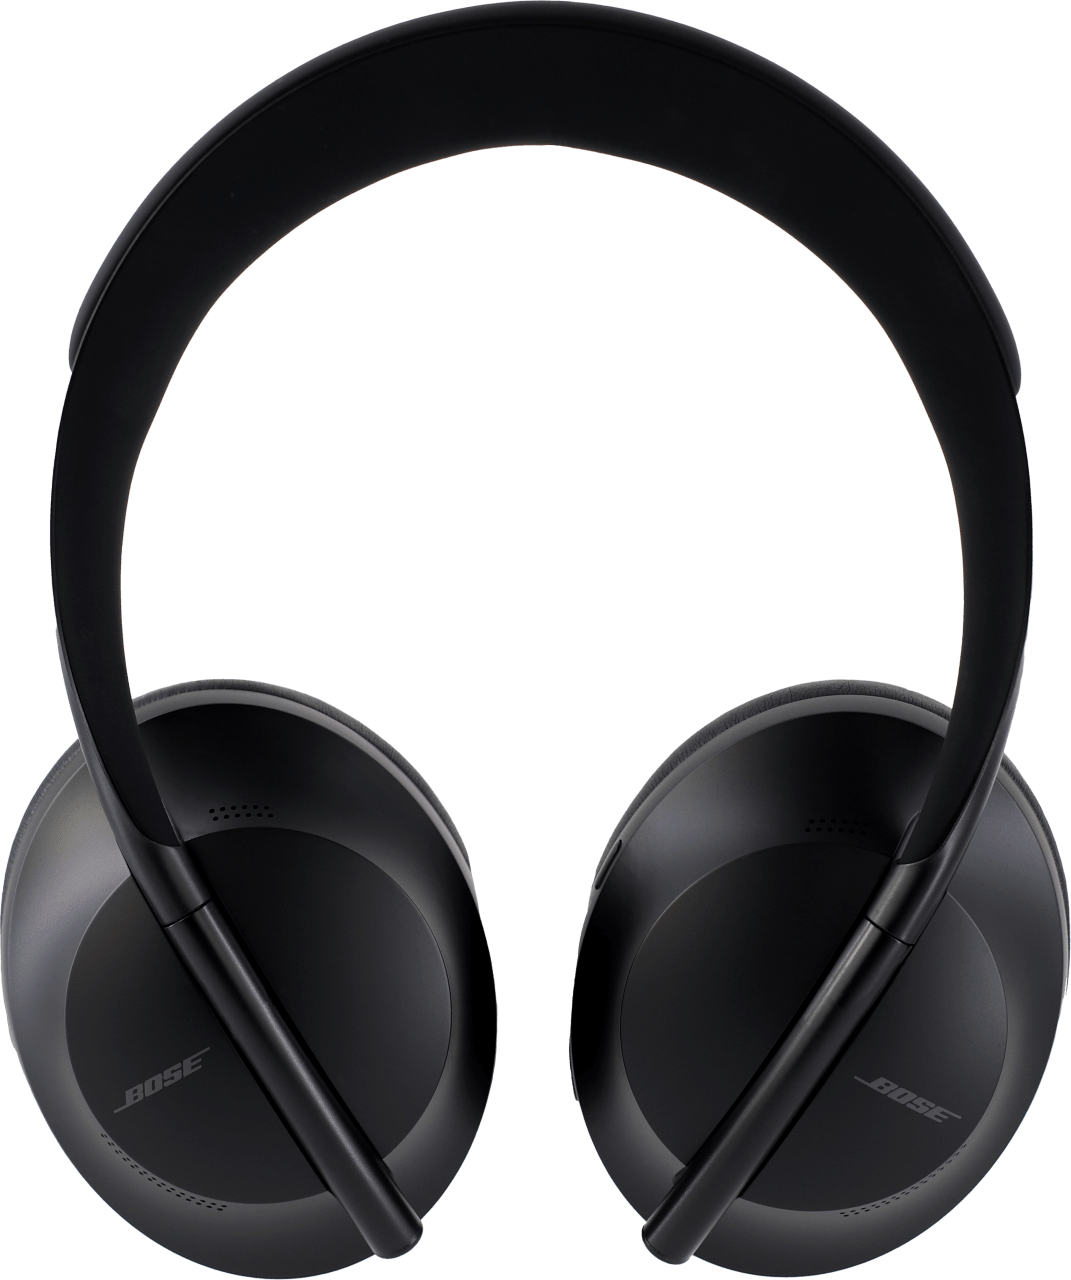 Black Bose 700 Over-ear Bluetooth Headphones.2